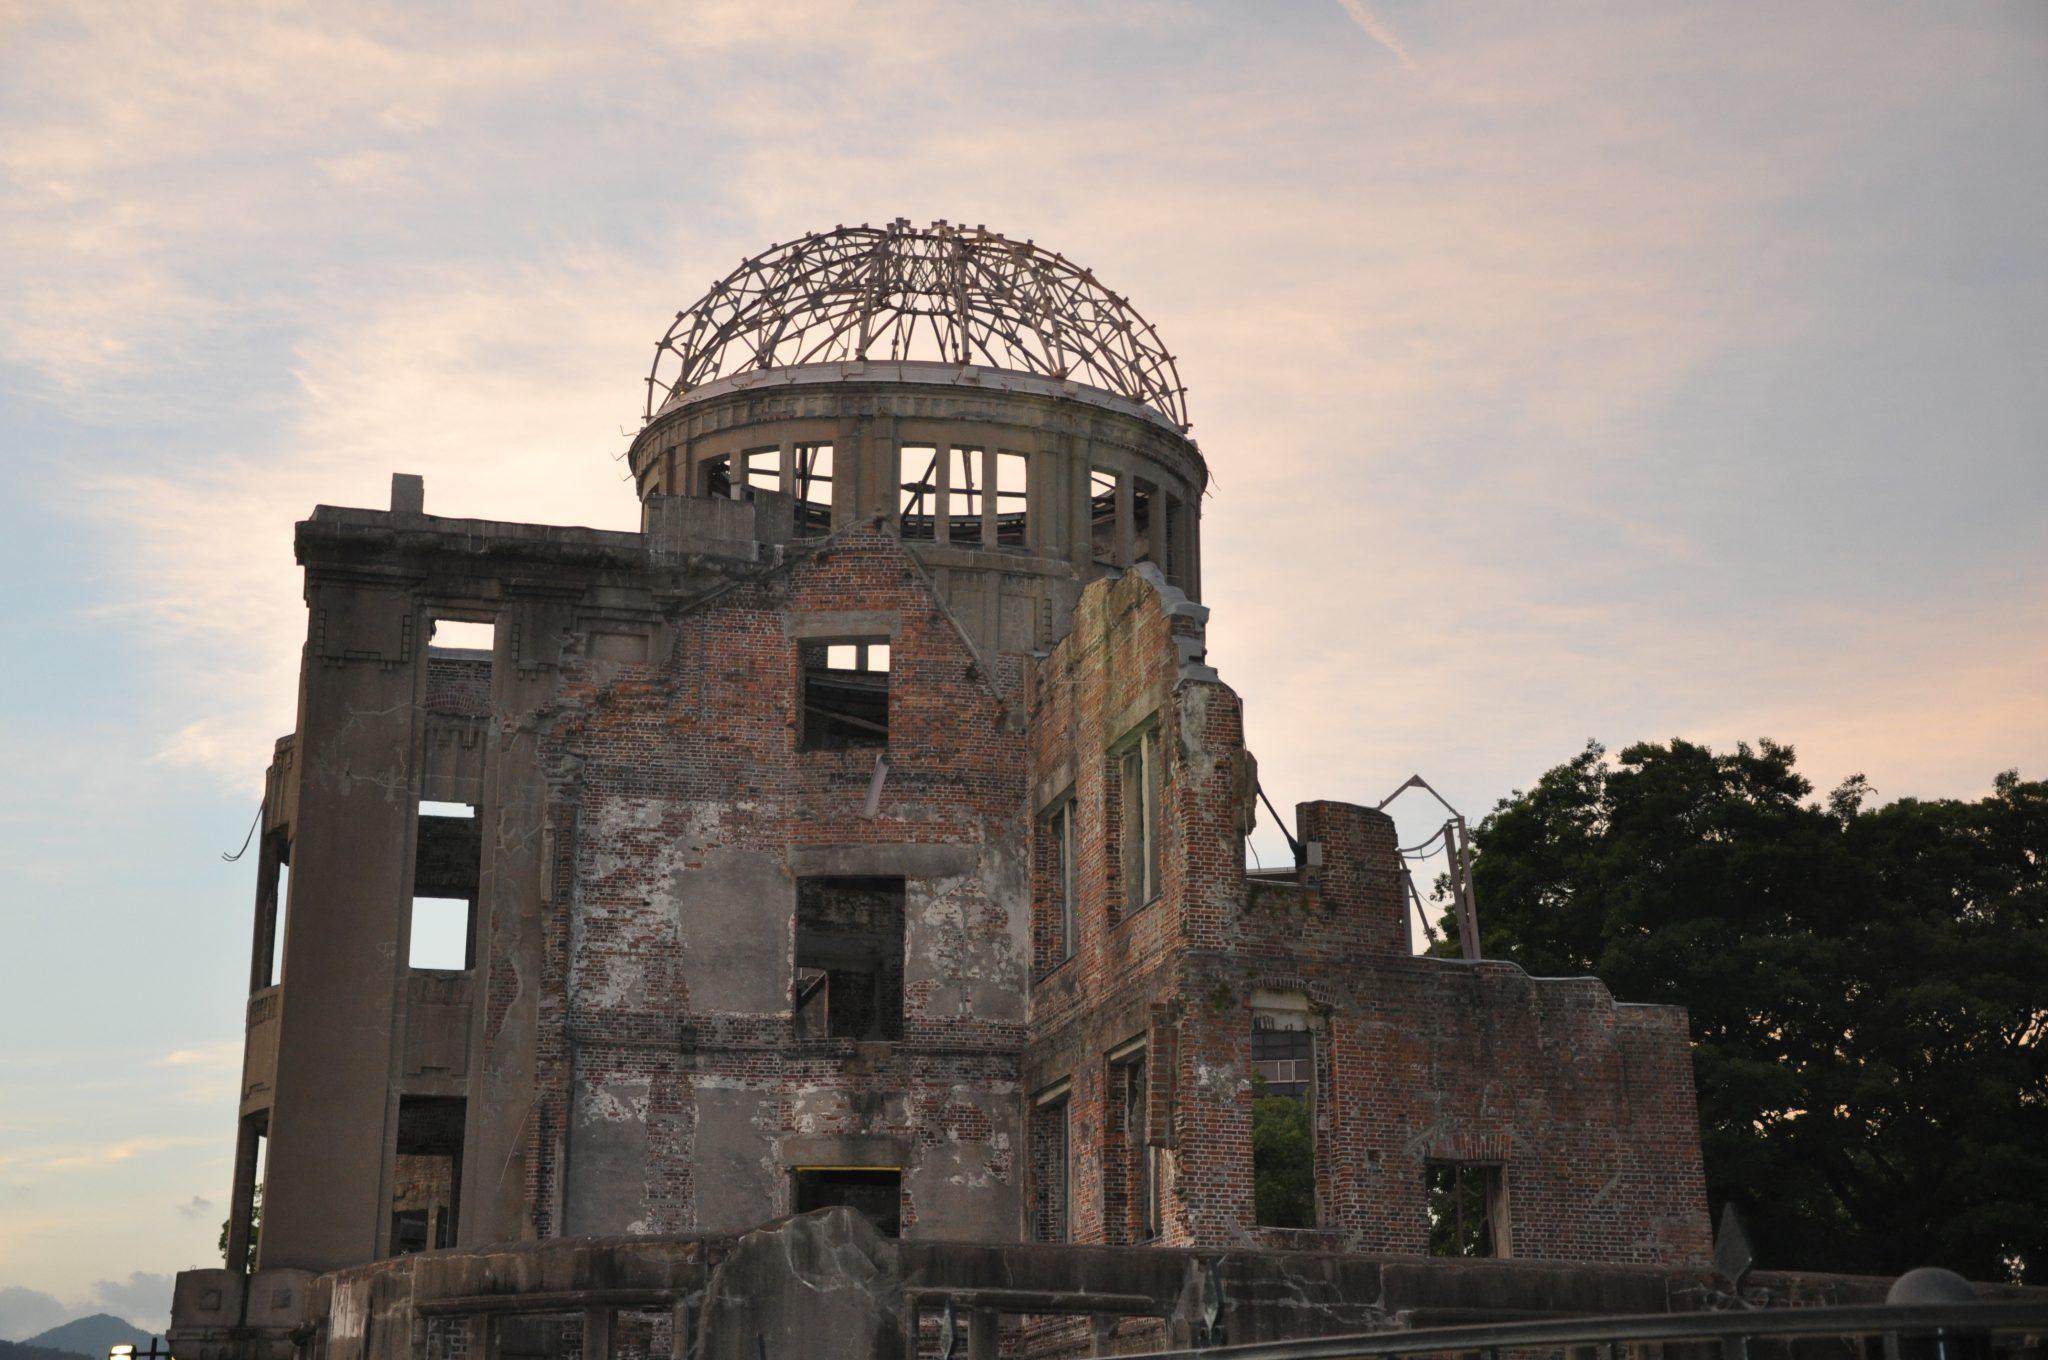 Hiroszima - Atomic Bomb Dome